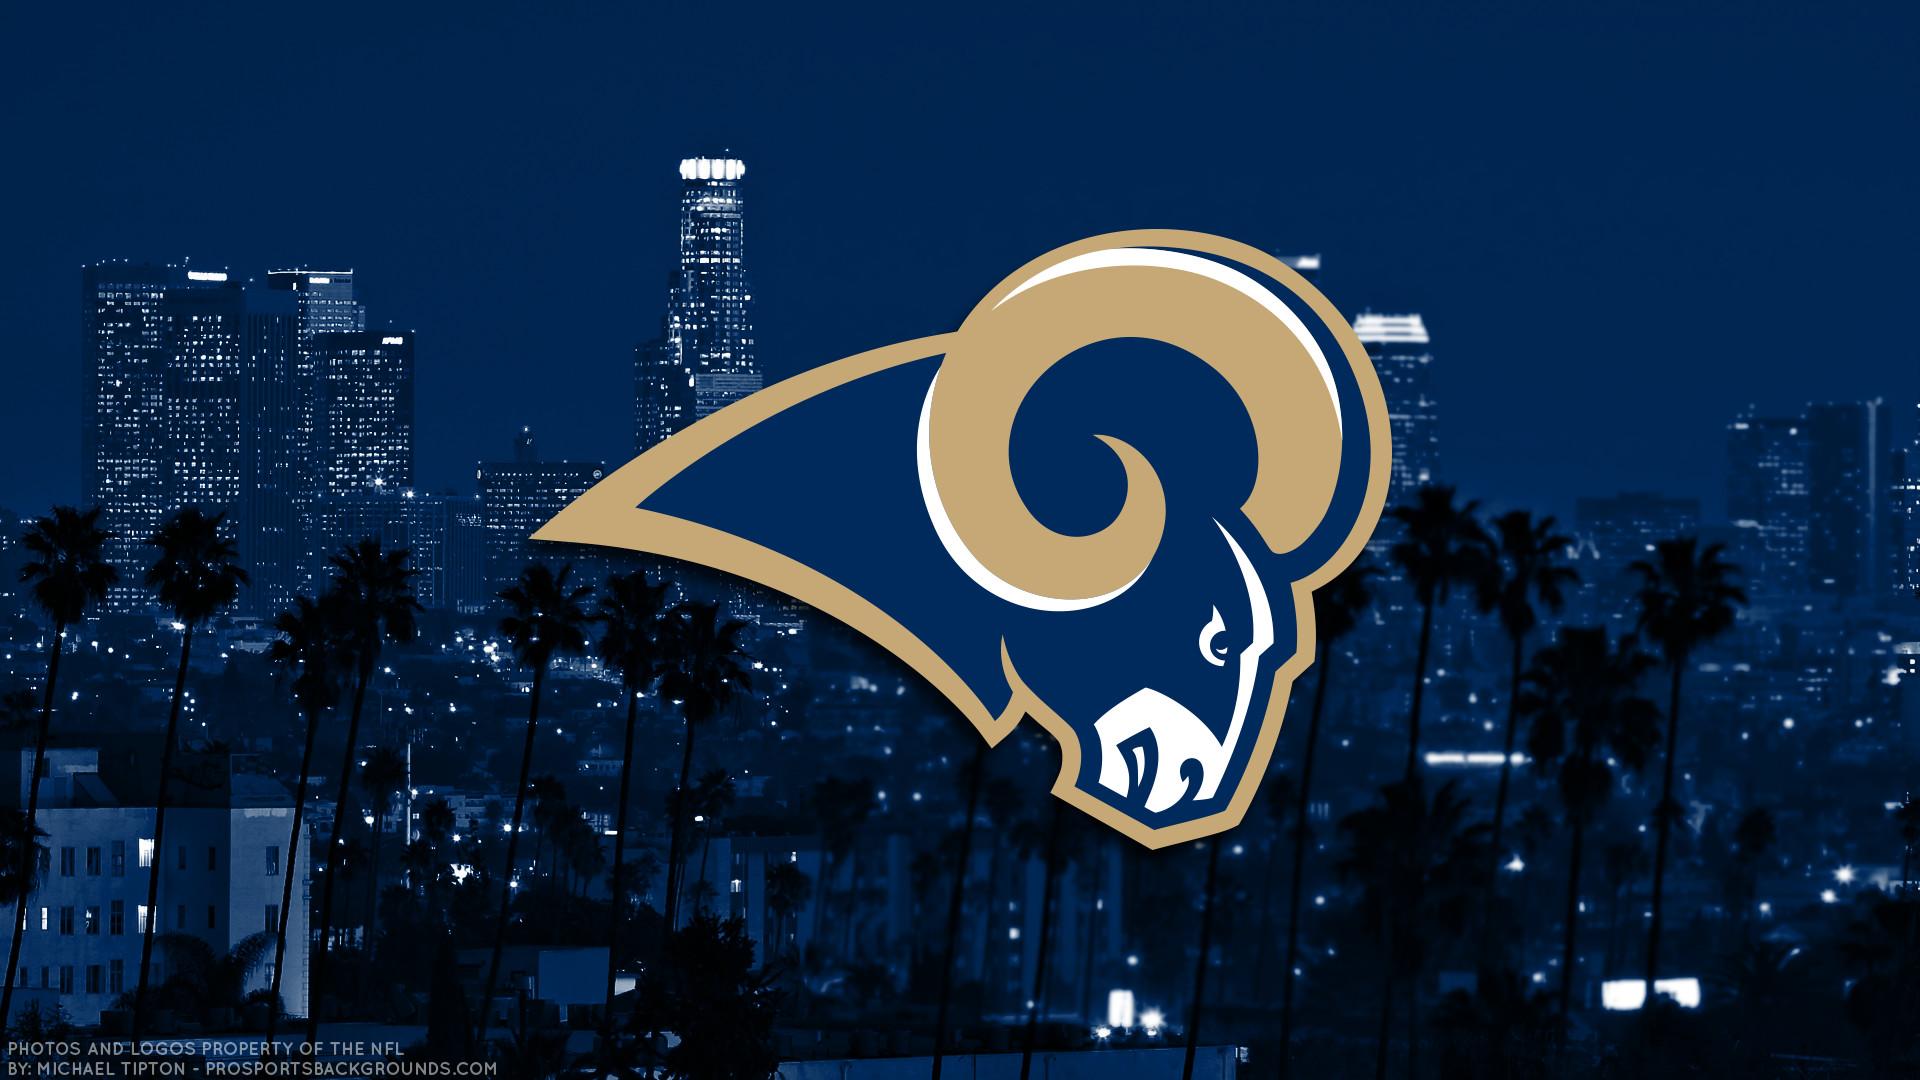 … Los Angeles Rams 2017 football logo wallpaper pc desktop computer